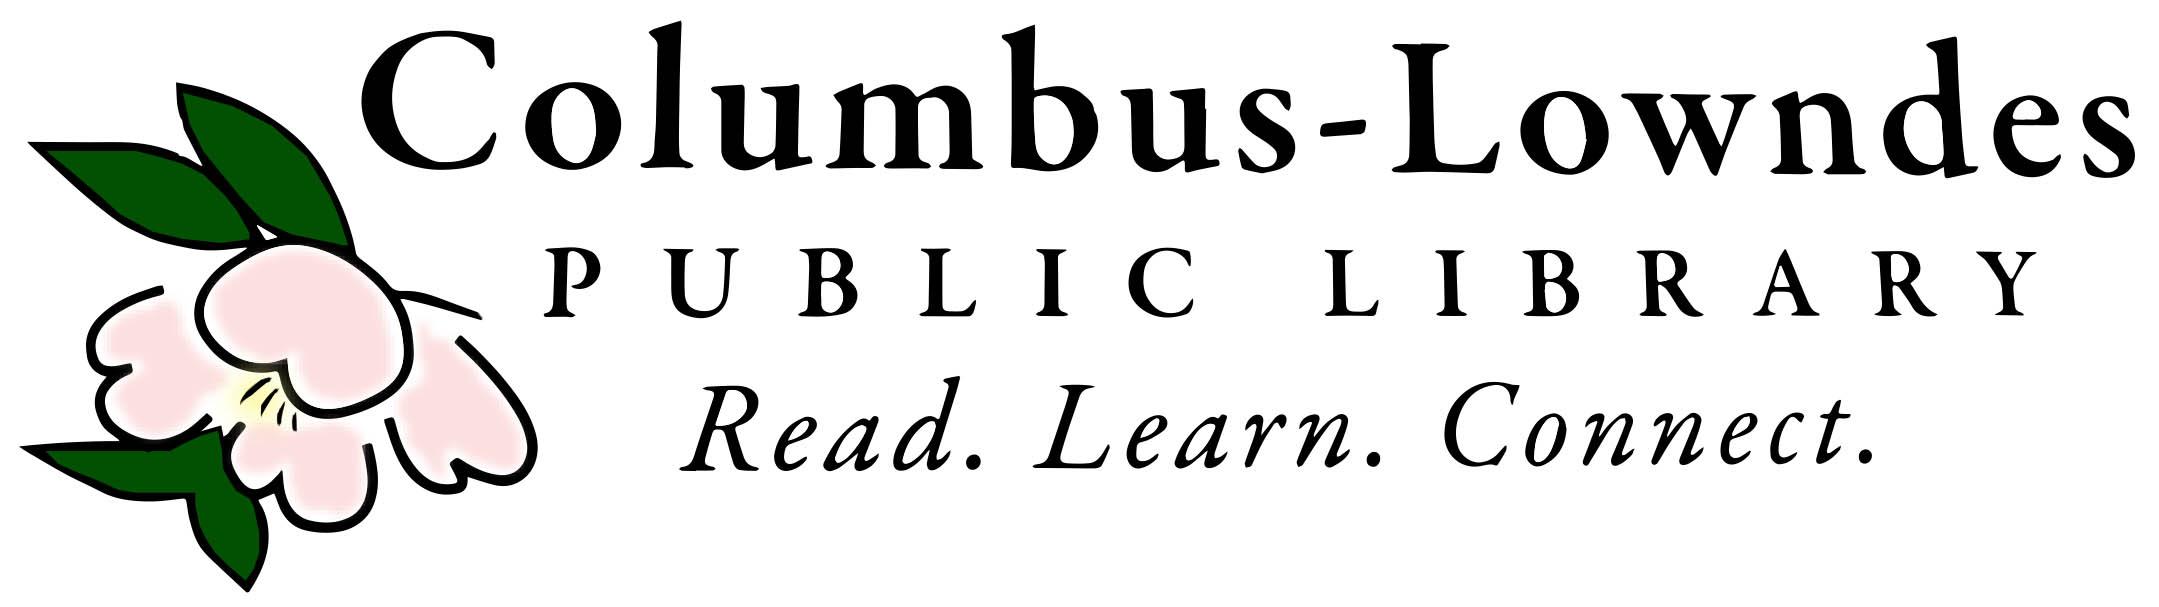 2019_Columbus-Lowndes Public Library.jpg